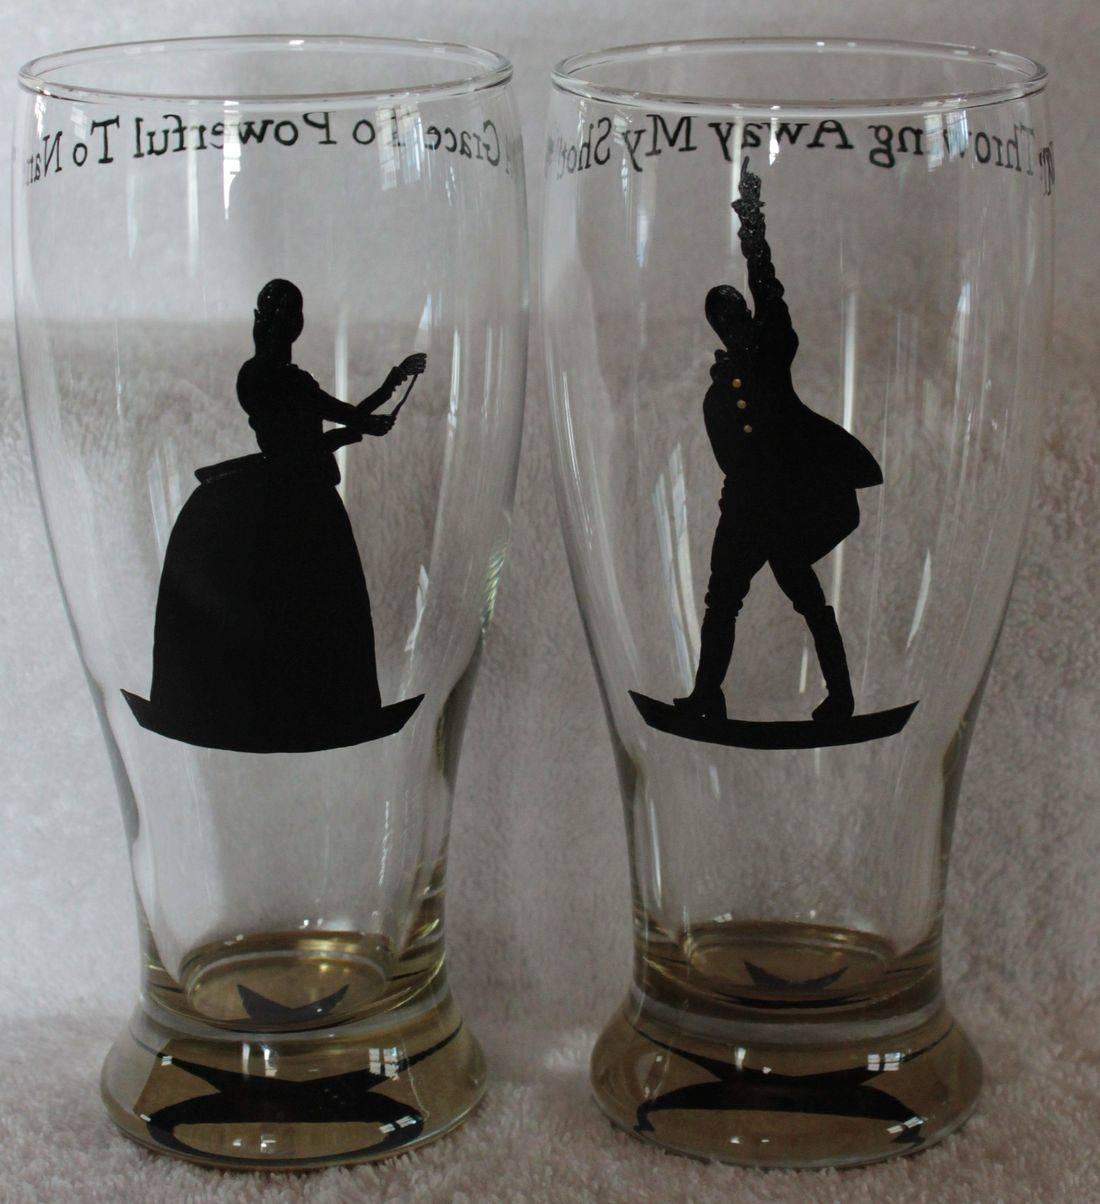 hamilton wine glass, hamilton beer glass